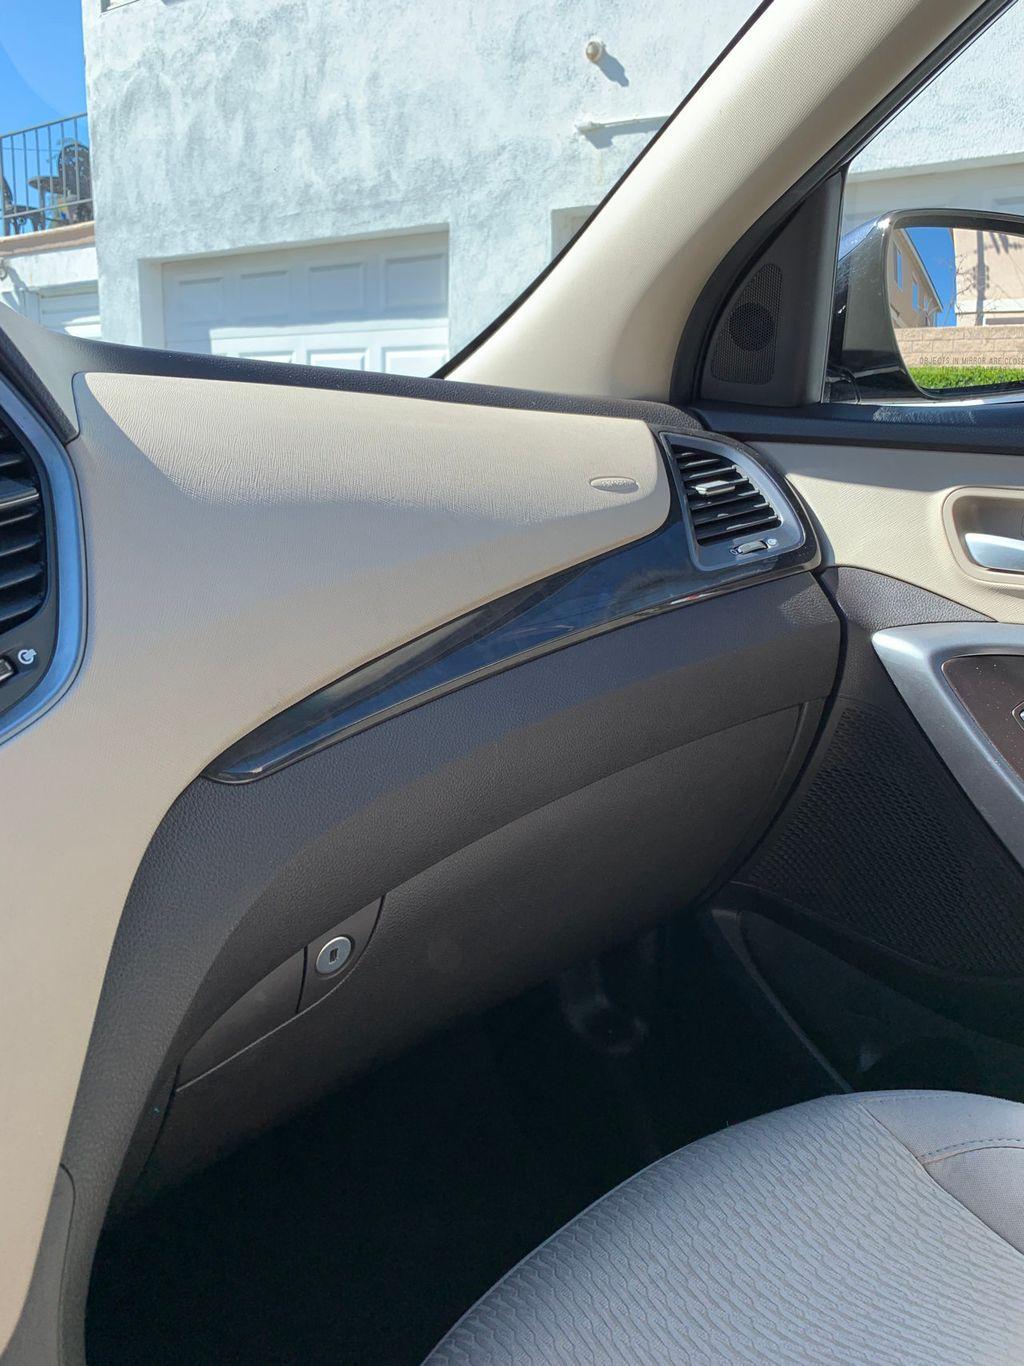 2017 Hyundai Santa Fe Sport 2.4L Automatic - 18574995 - 27